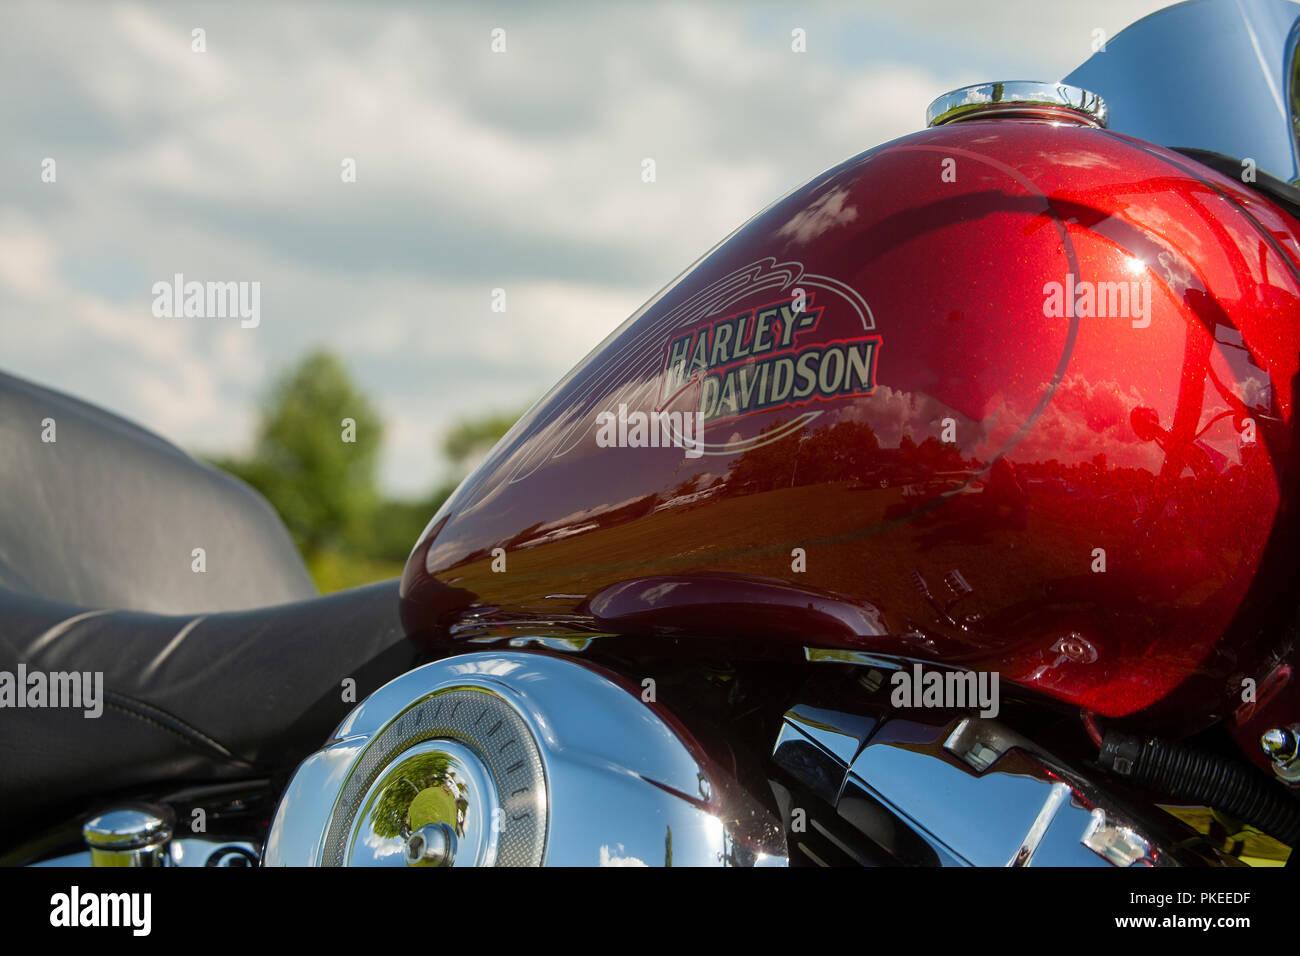 Closeup of Gleaming Red Harley-Davidson Sportster motorbike fuel tank - Stock Image